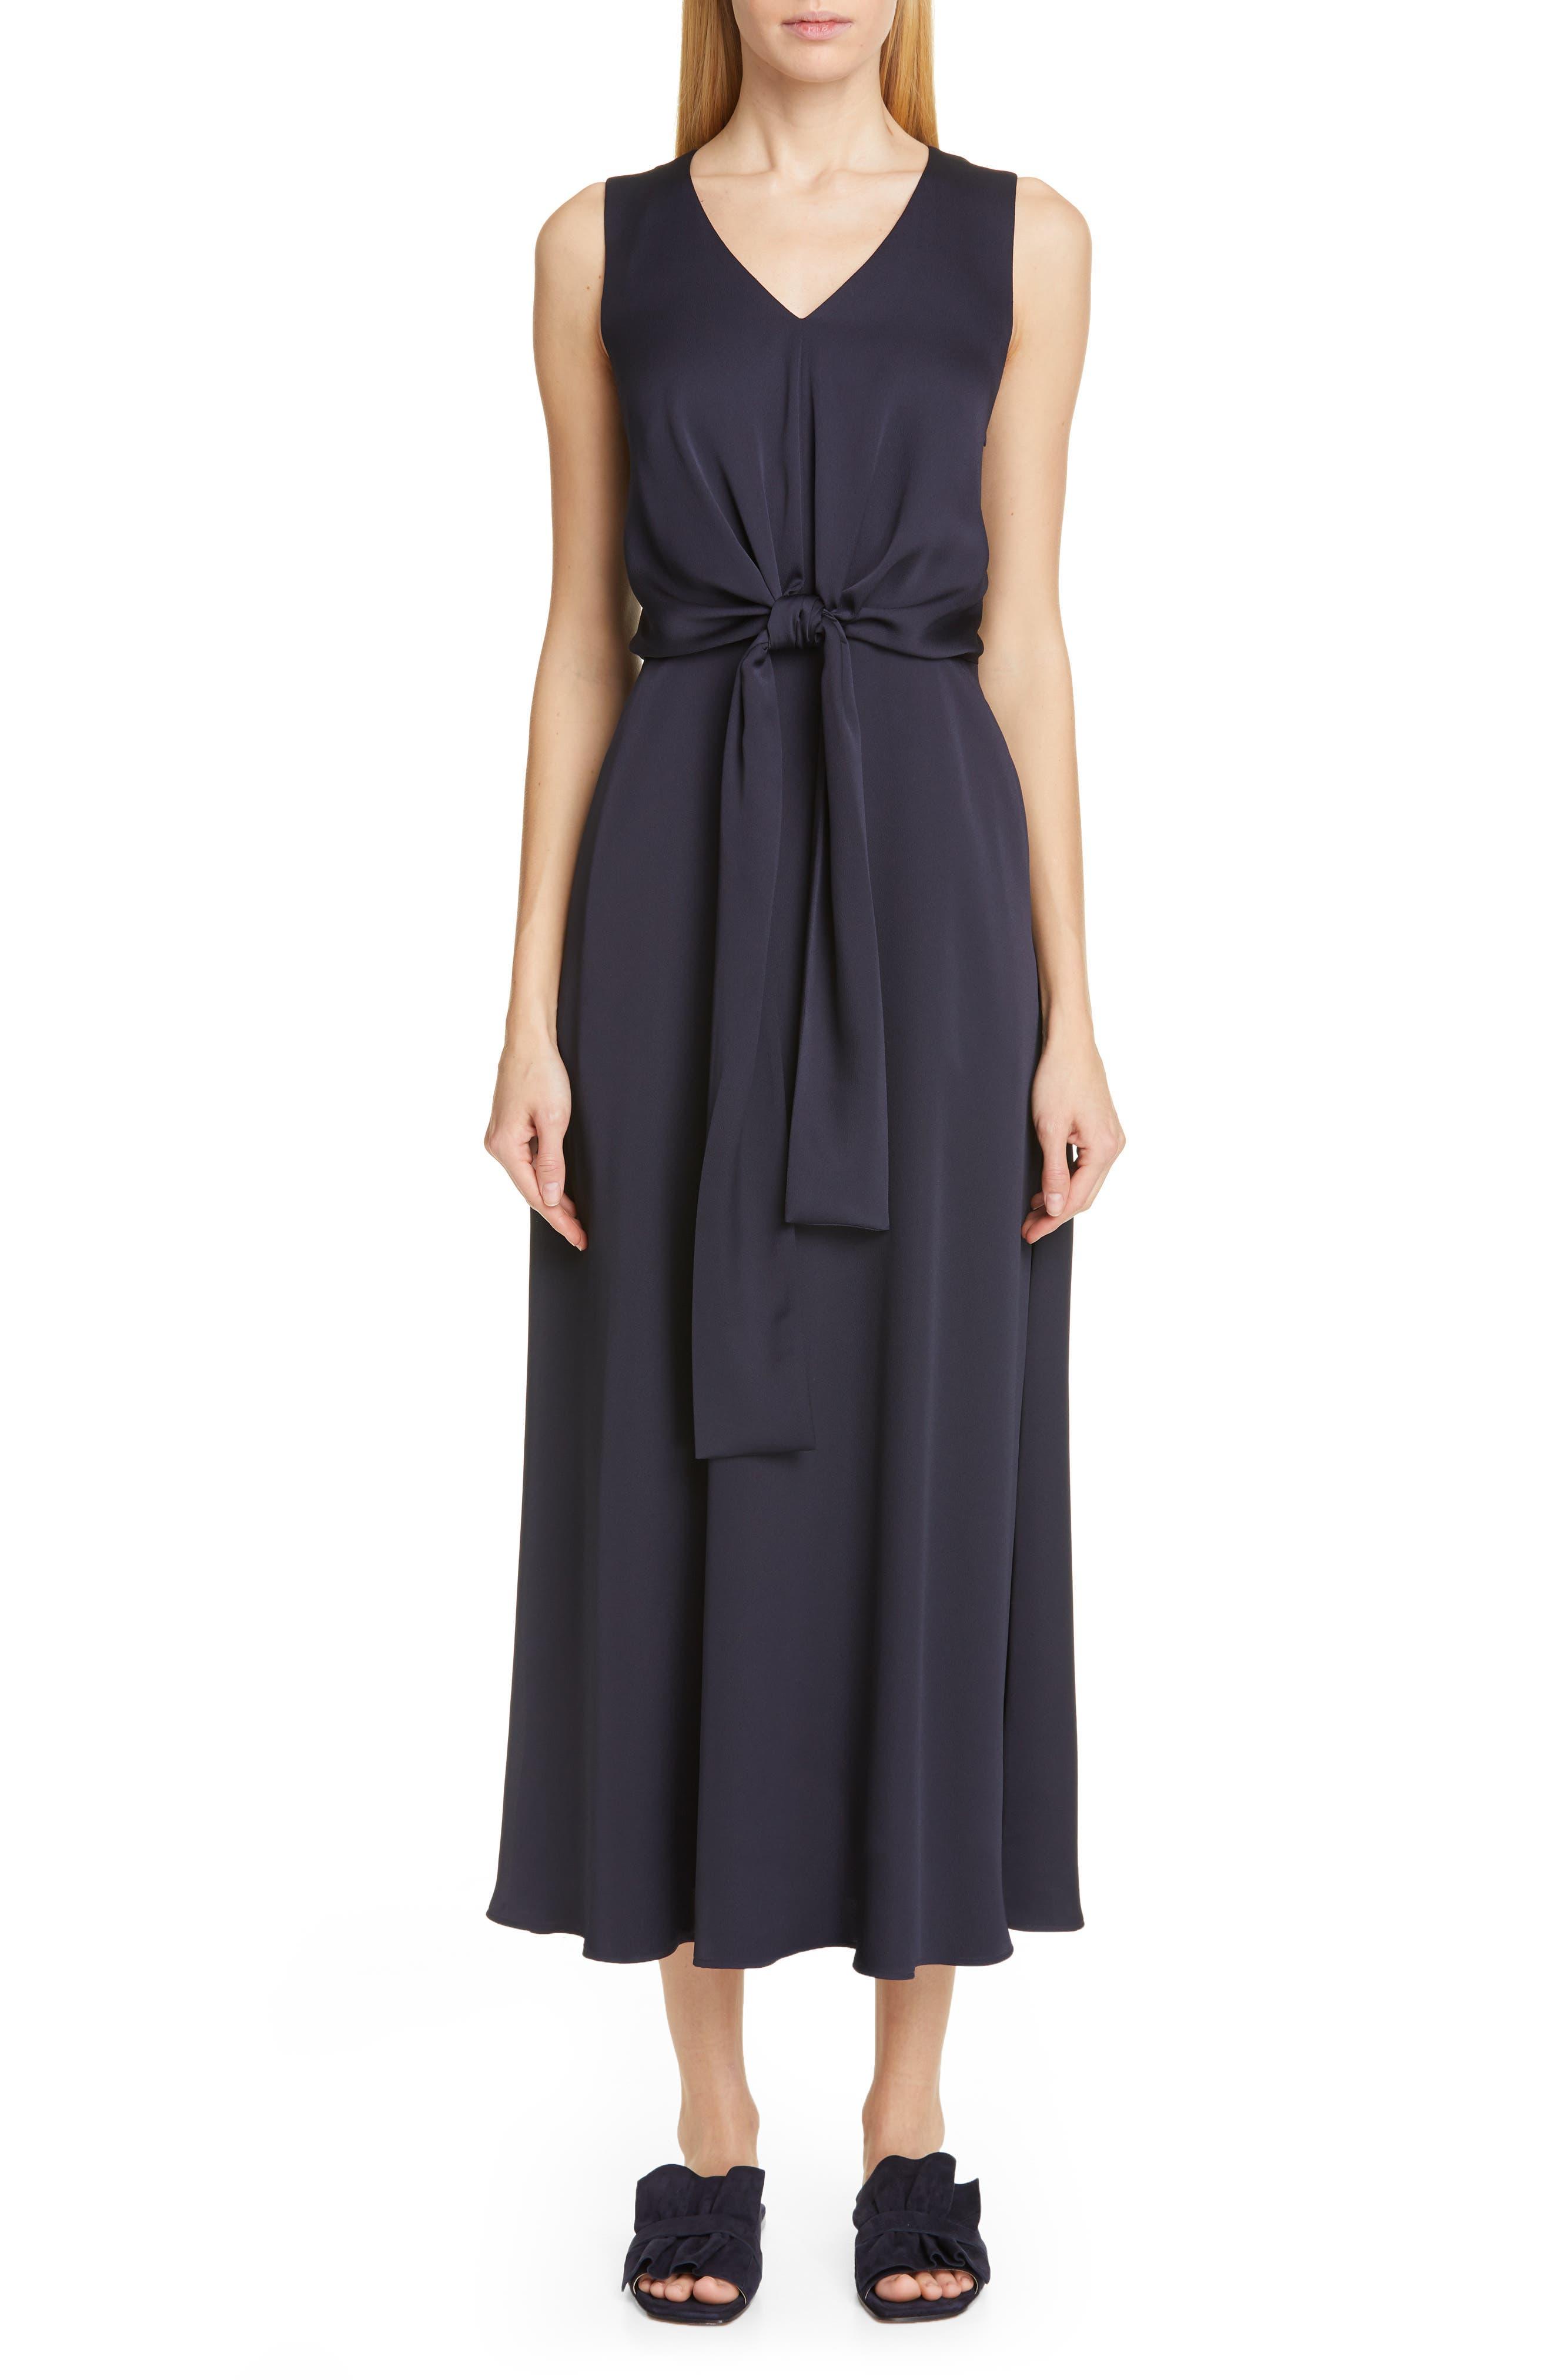 LAFAYETTE 148 NEW YORK Ambrosia Tie Waist Midi Dress, Main, color, INK